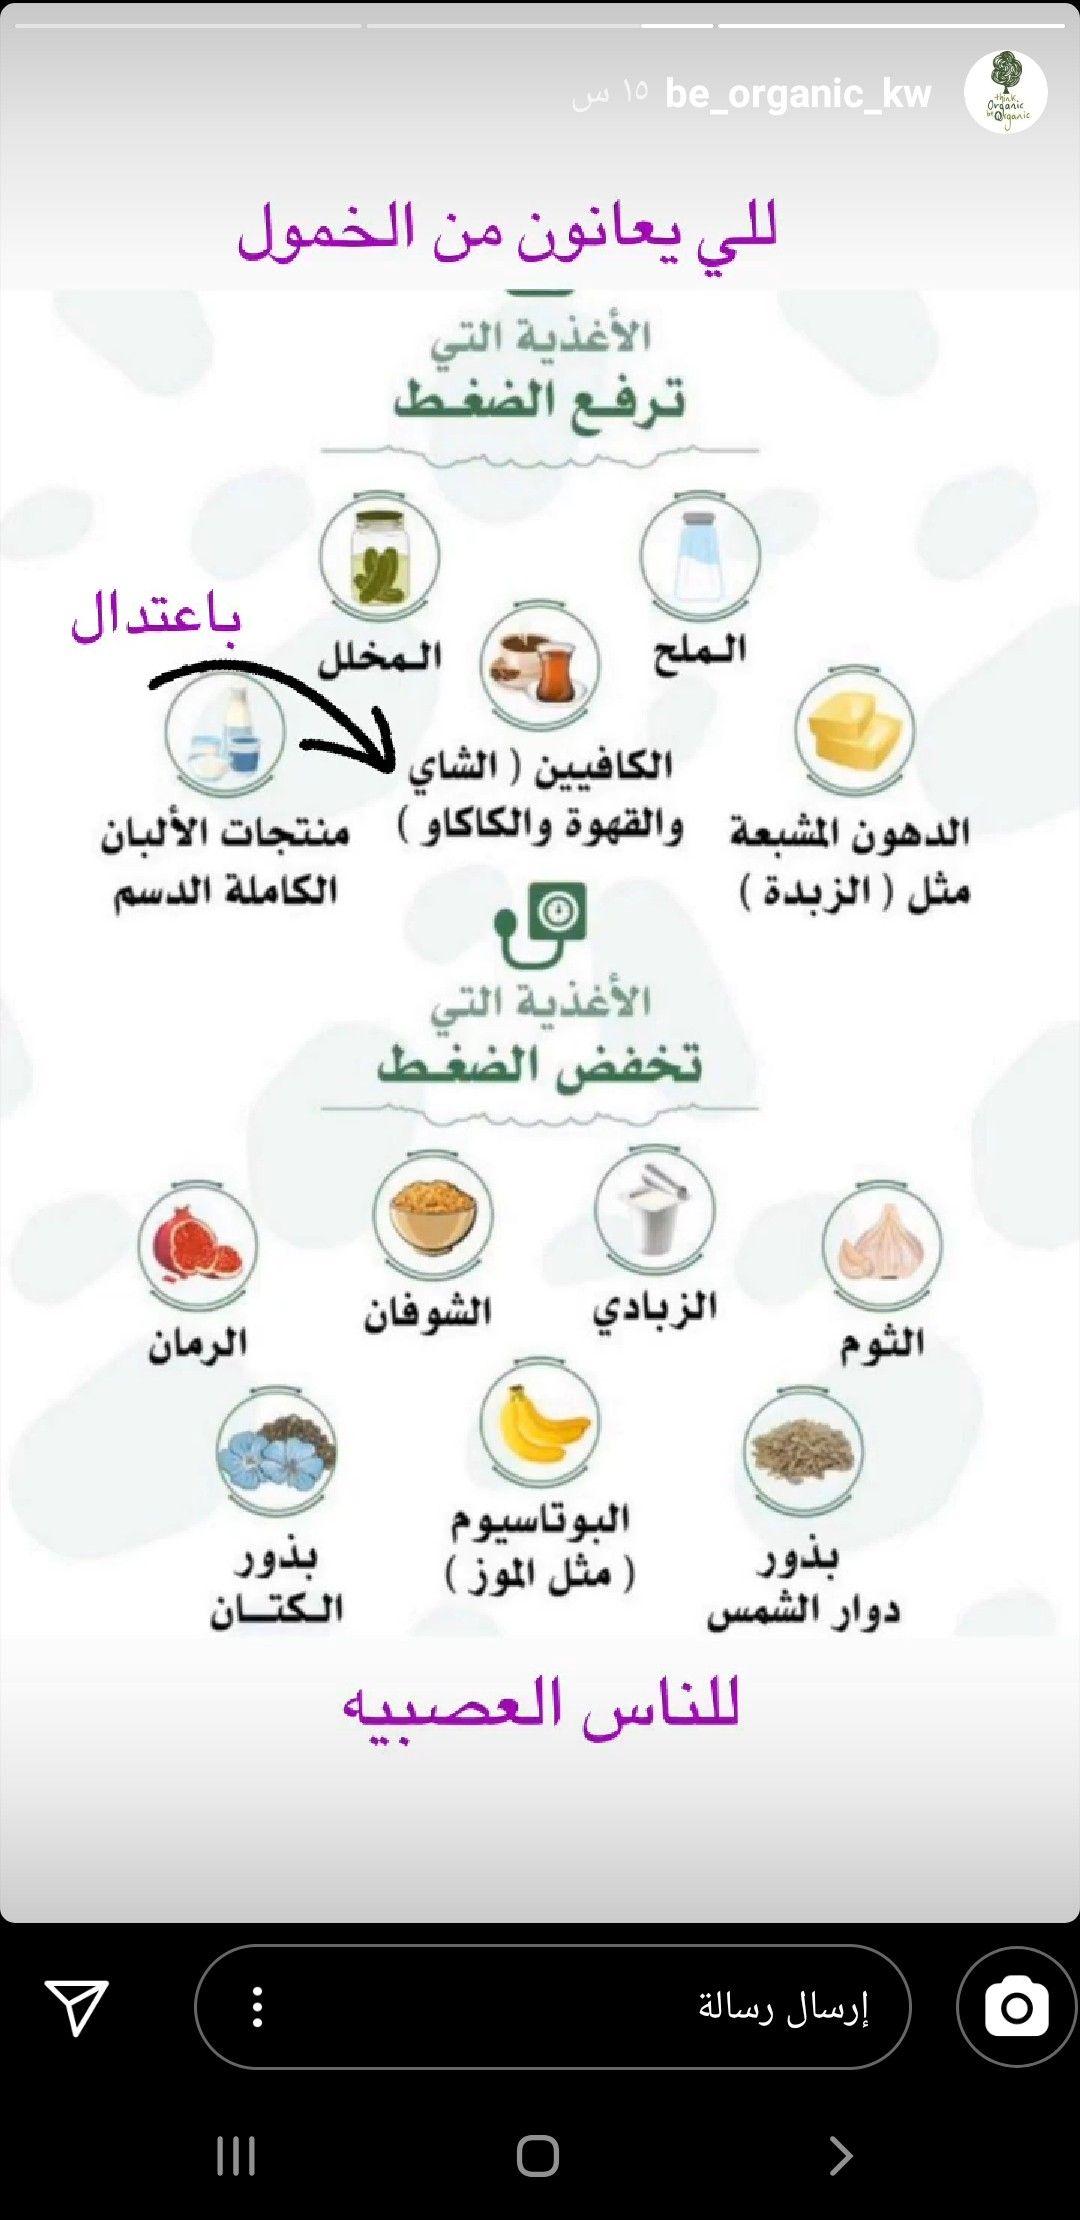 Pin By Aman On تغذية علاجية المعدة بيت الداء و الدواء توعية Shopping